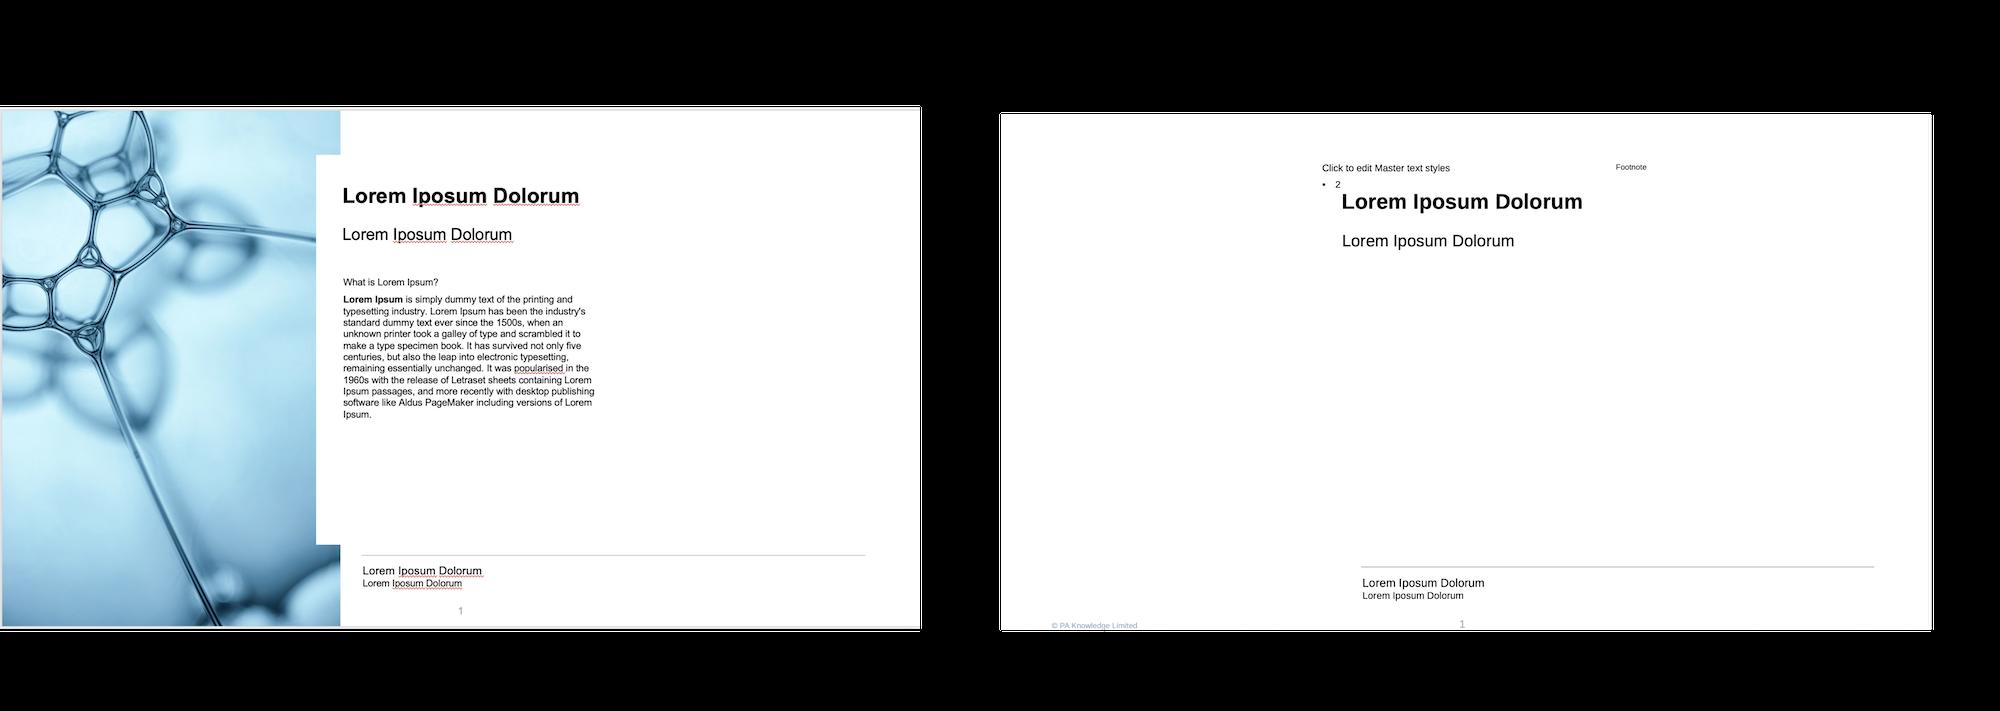 Openoffice writer_pdf_export